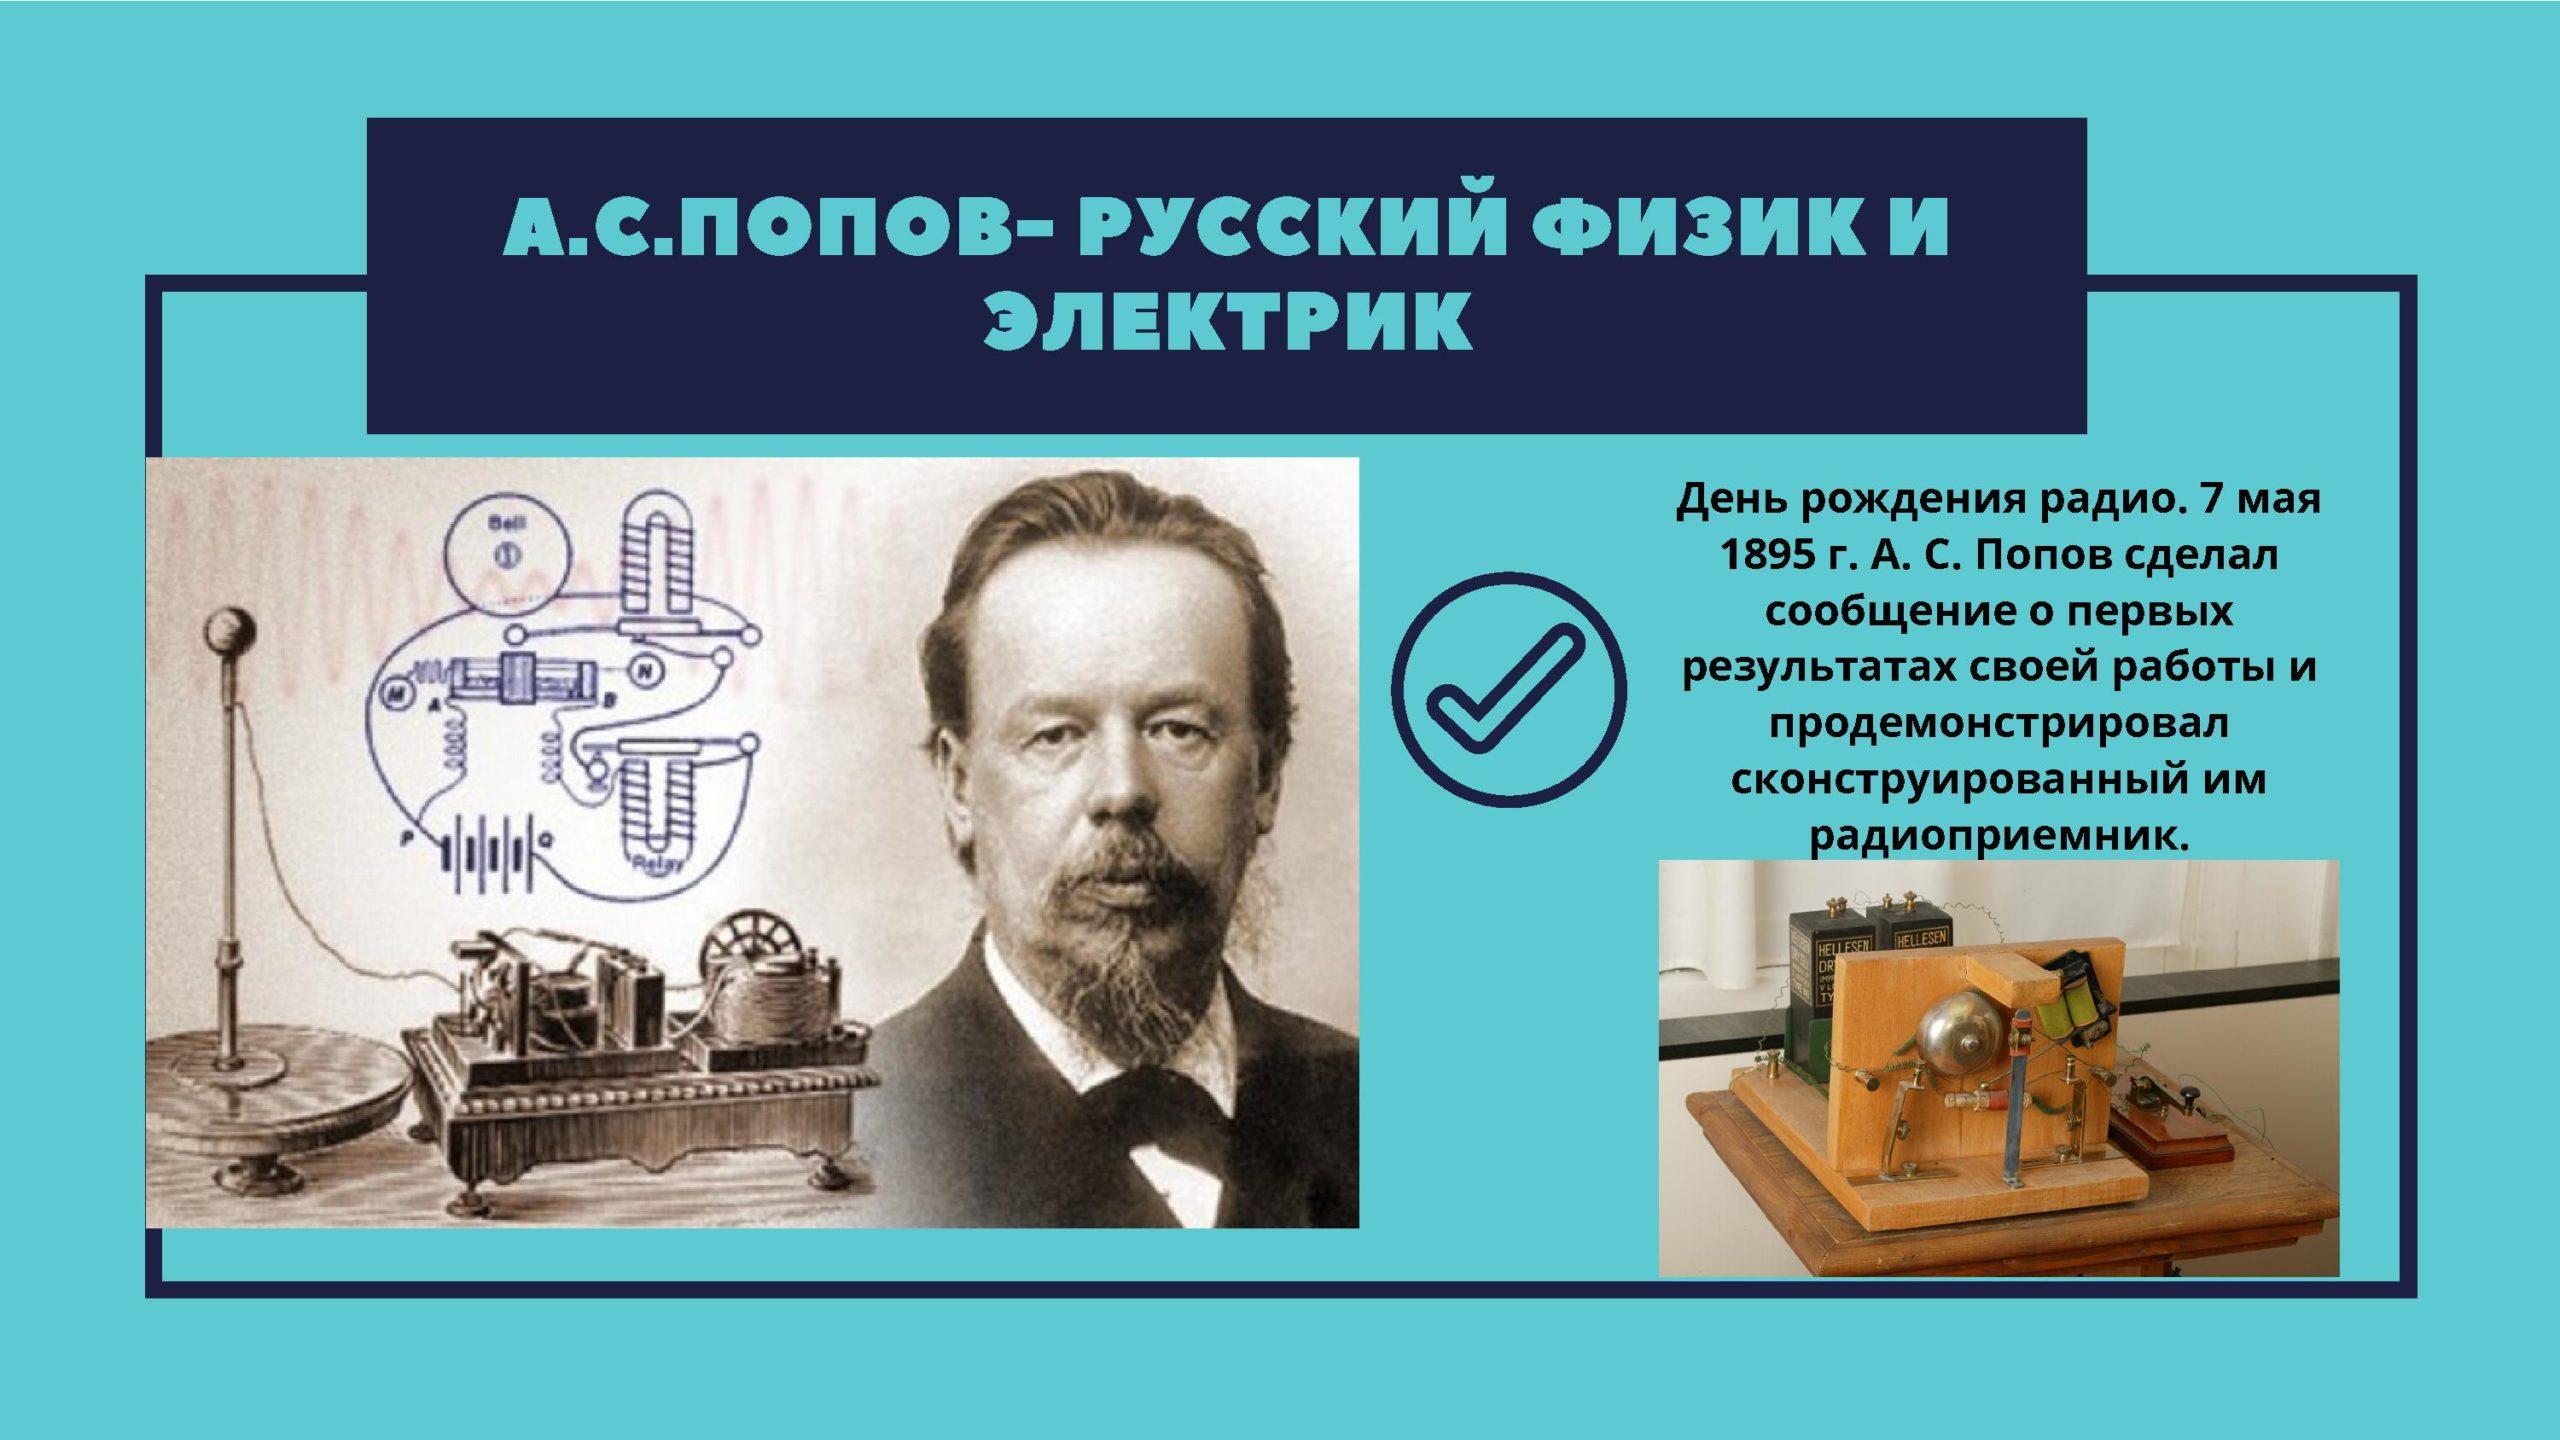 А. С. Попов - русский физик и электрик